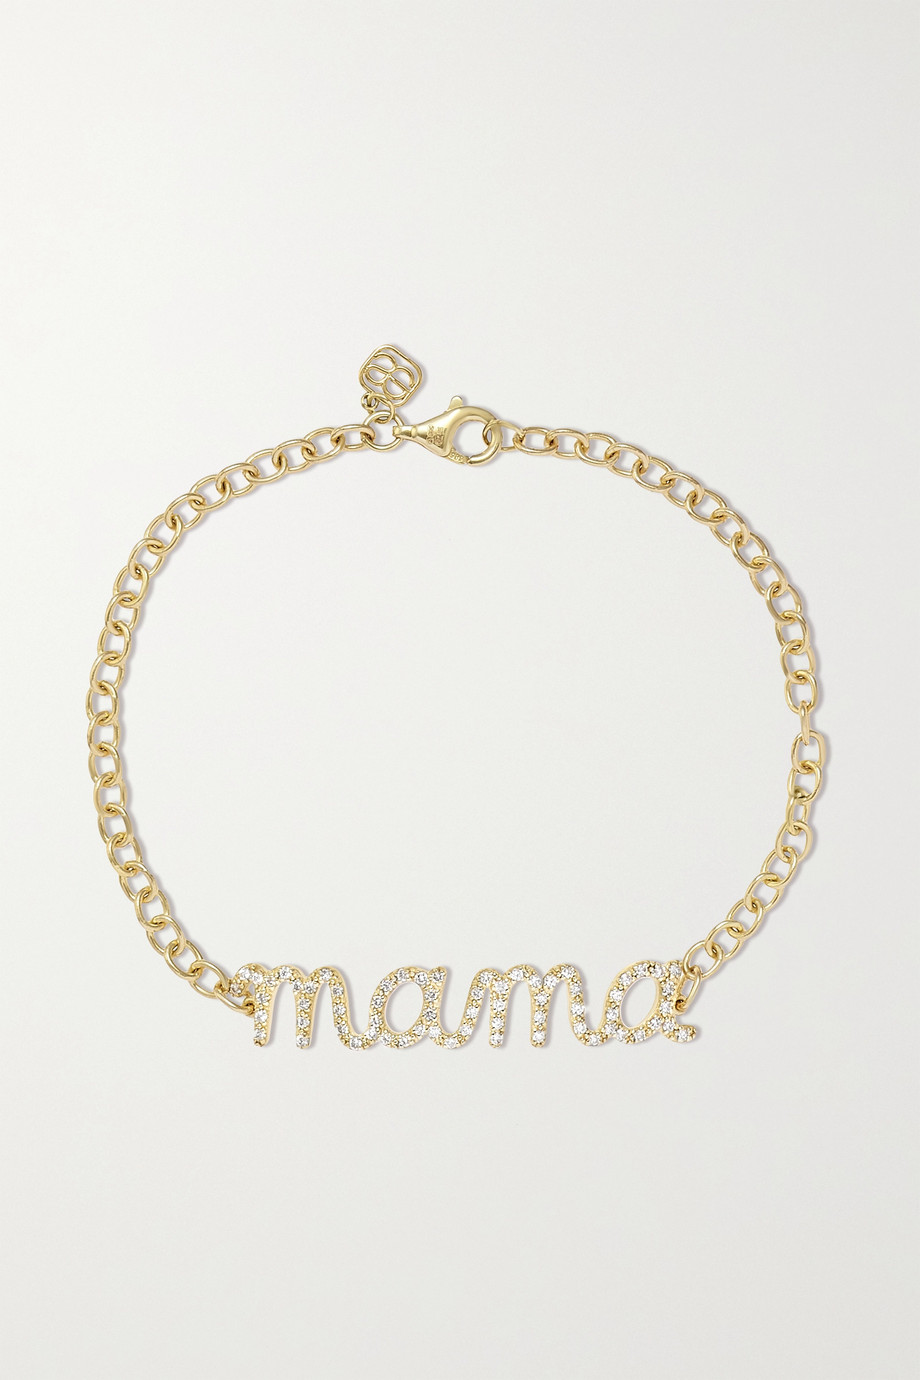 Sydney Evan Large Mama Script Armband aus 18 Karat Gold mit Diamanten